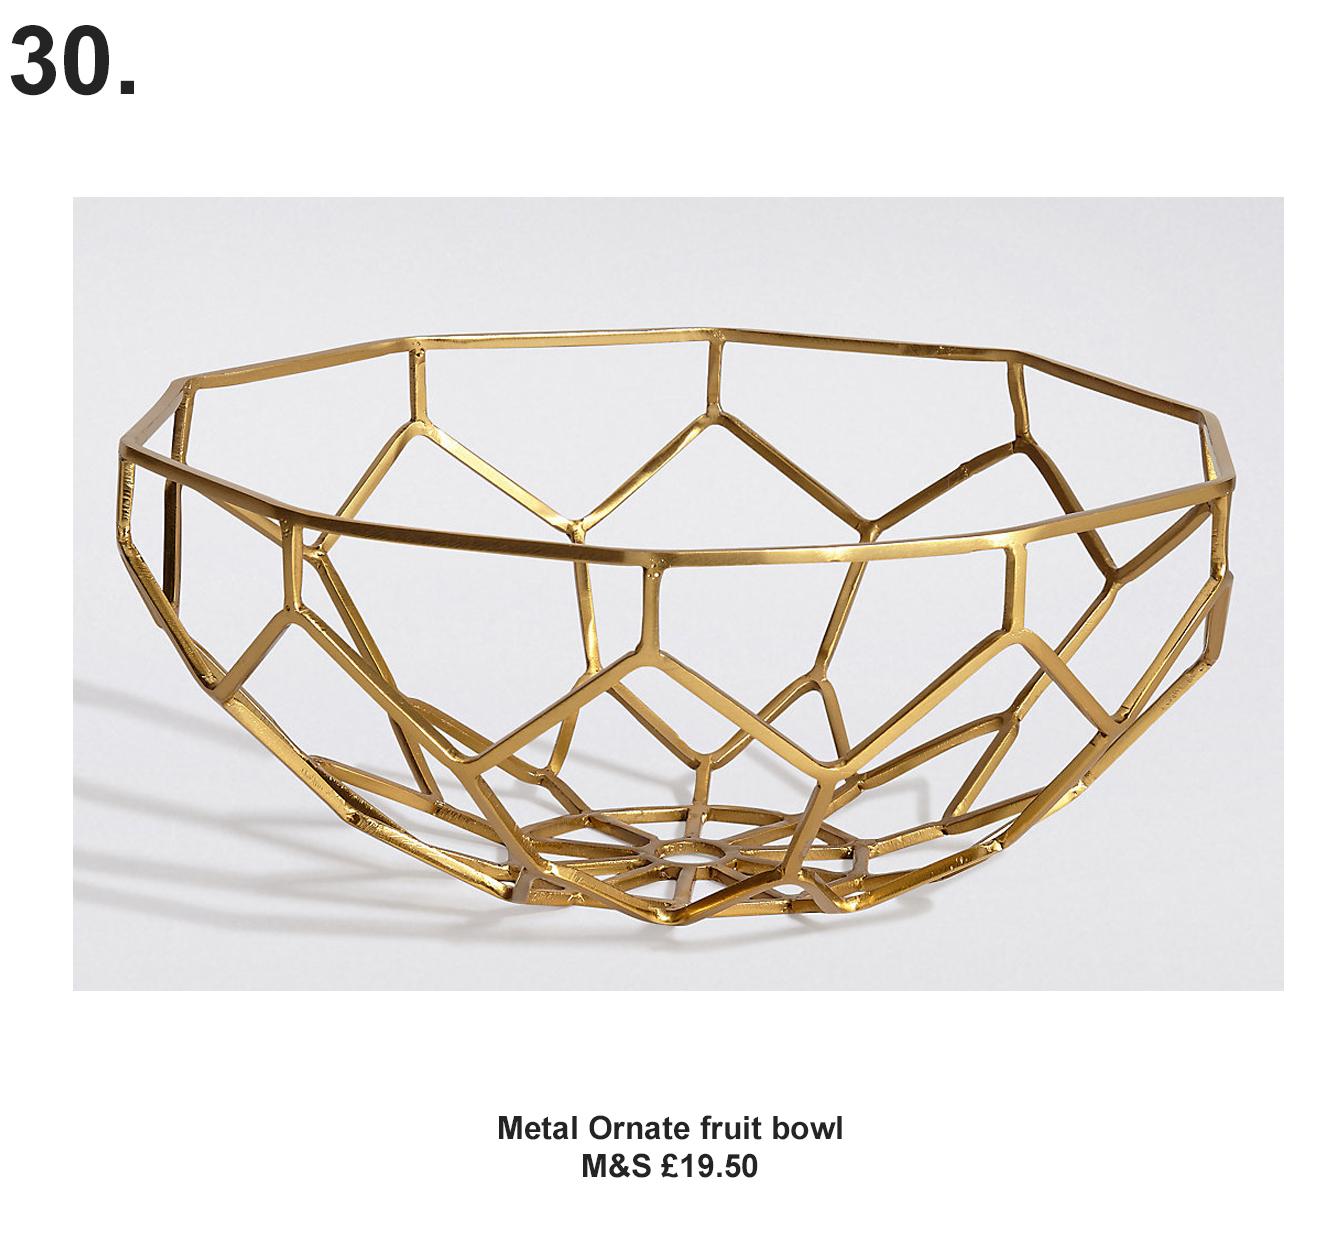 Metal Ornate Fruit Bowl, M&S £19.50